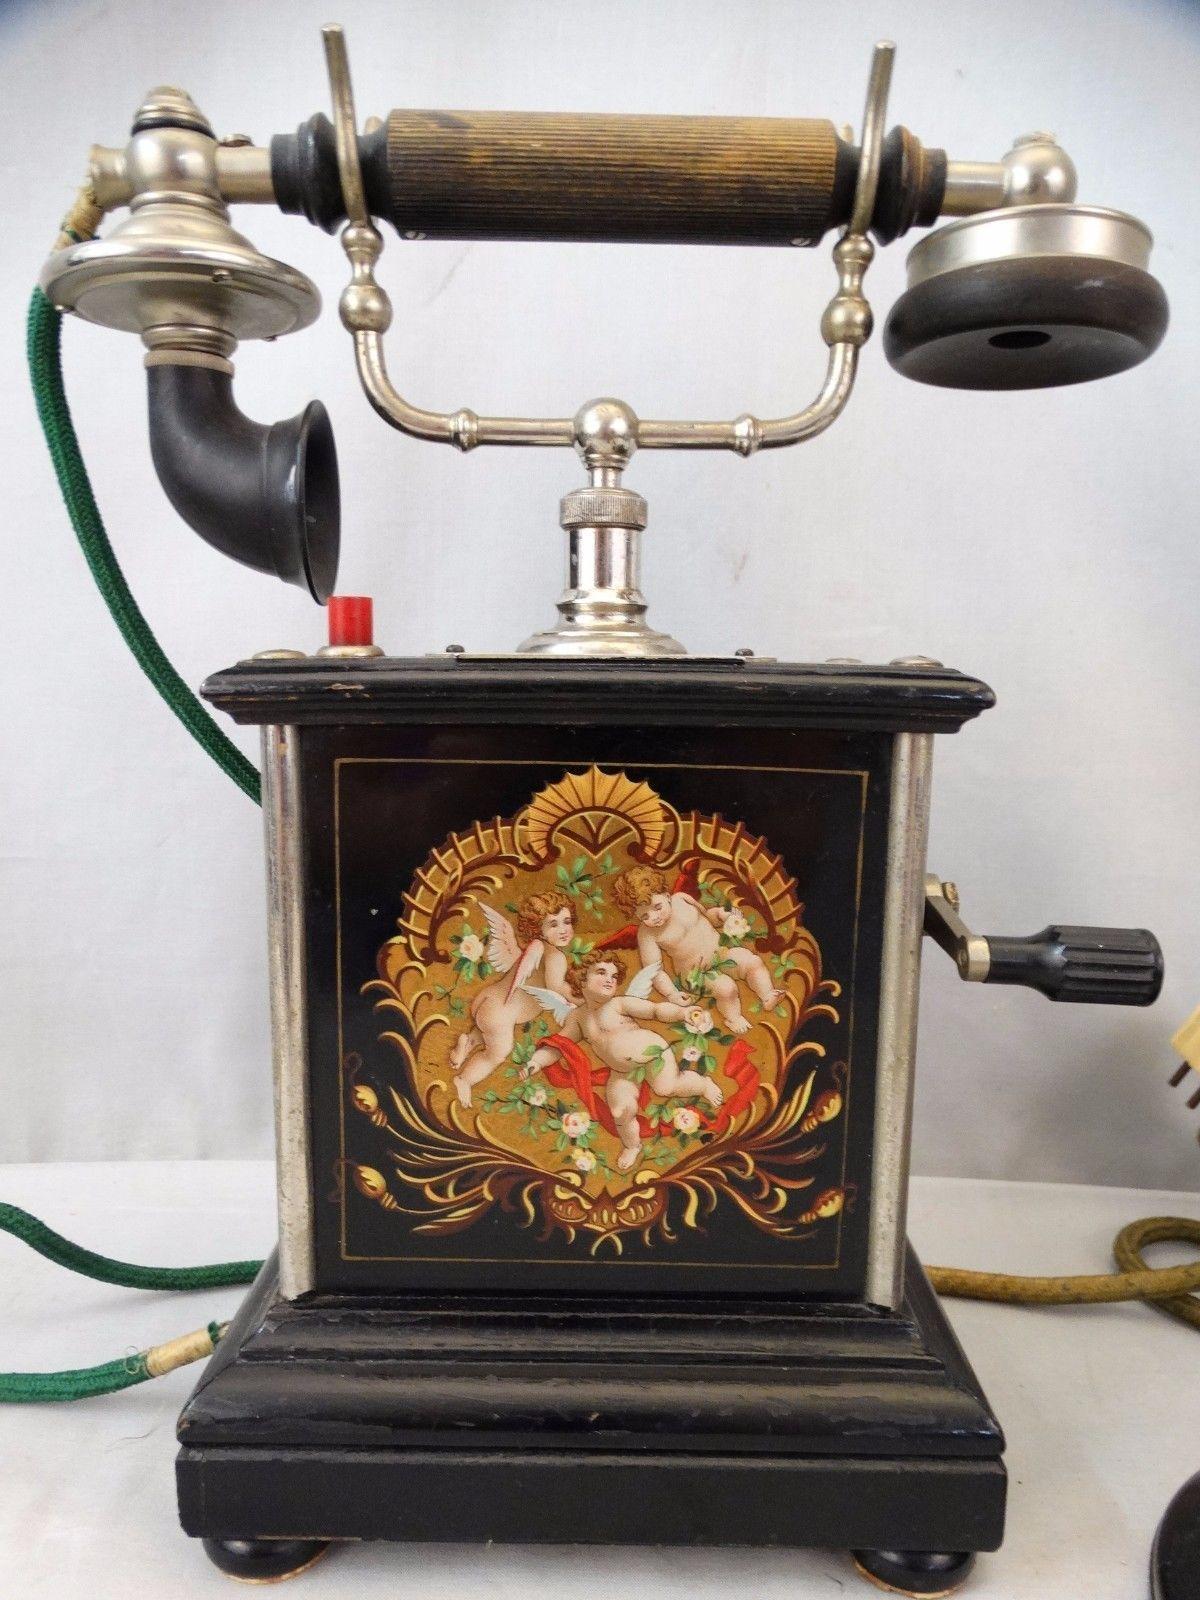 antique edwardian era danish victorian cherub old ktas crank phone | ebay